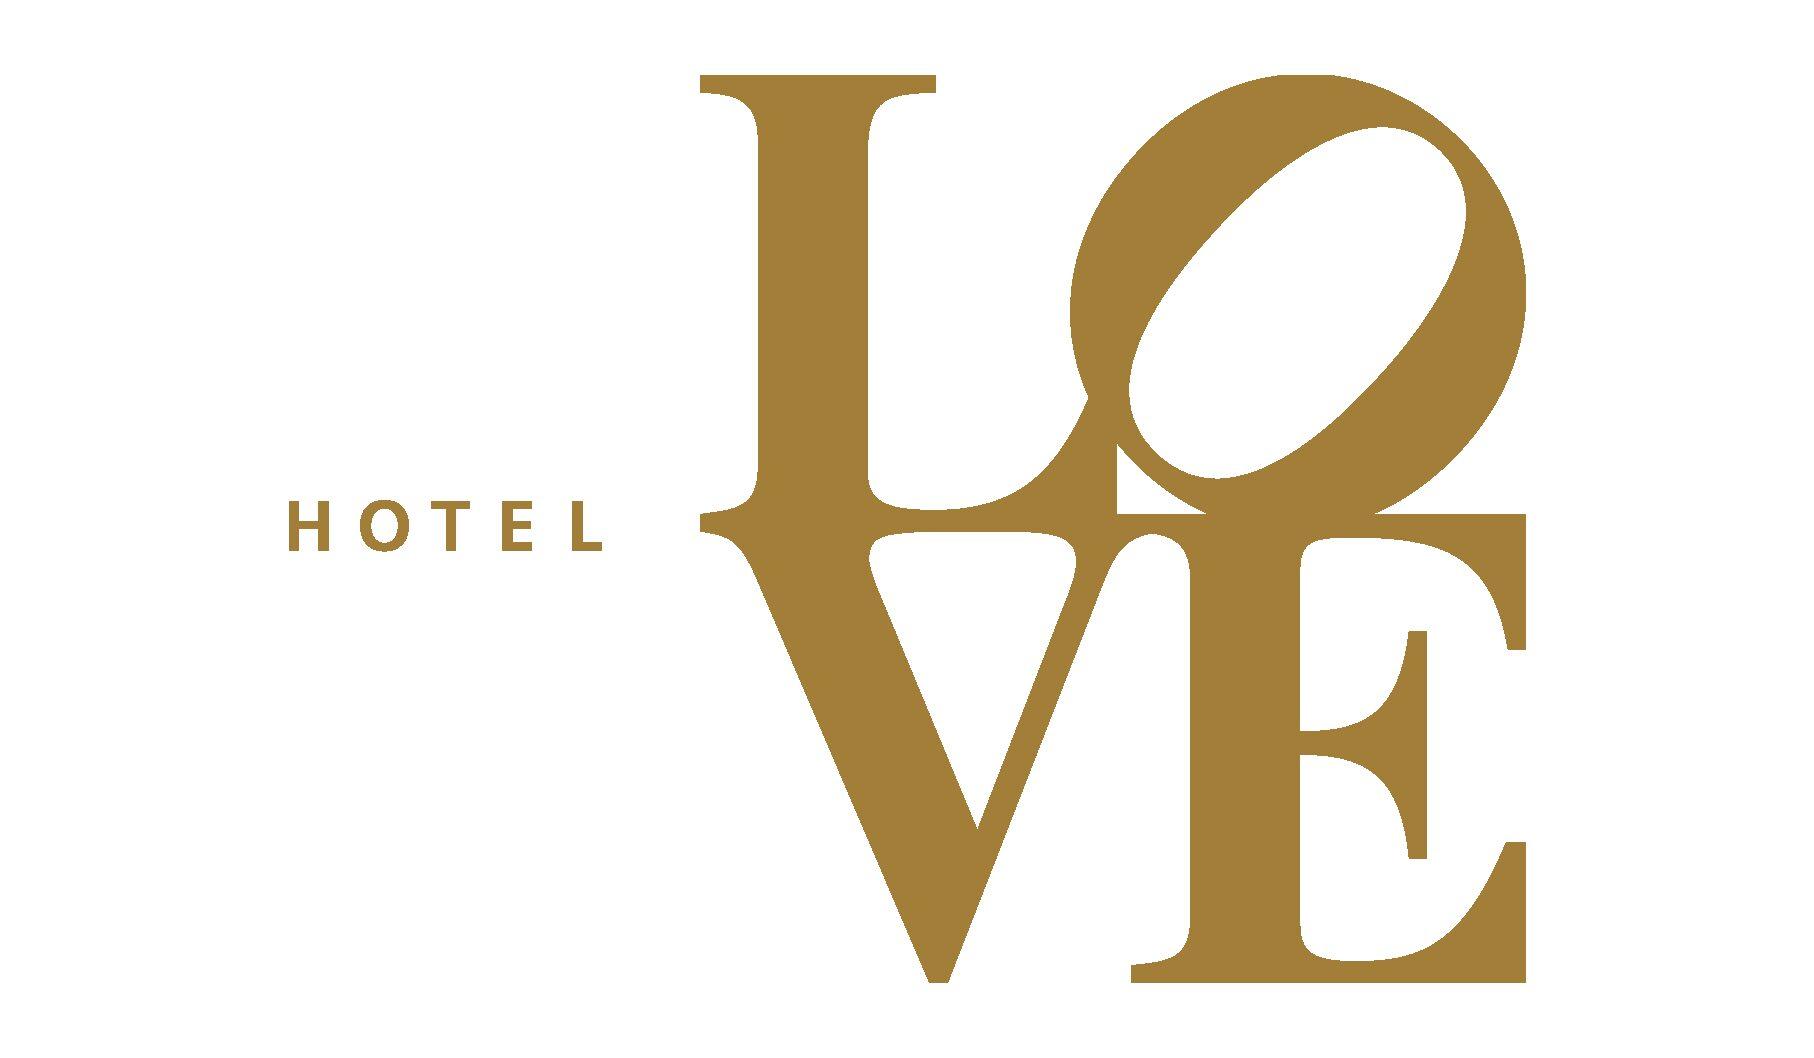 HOTEL LOVE 生玉